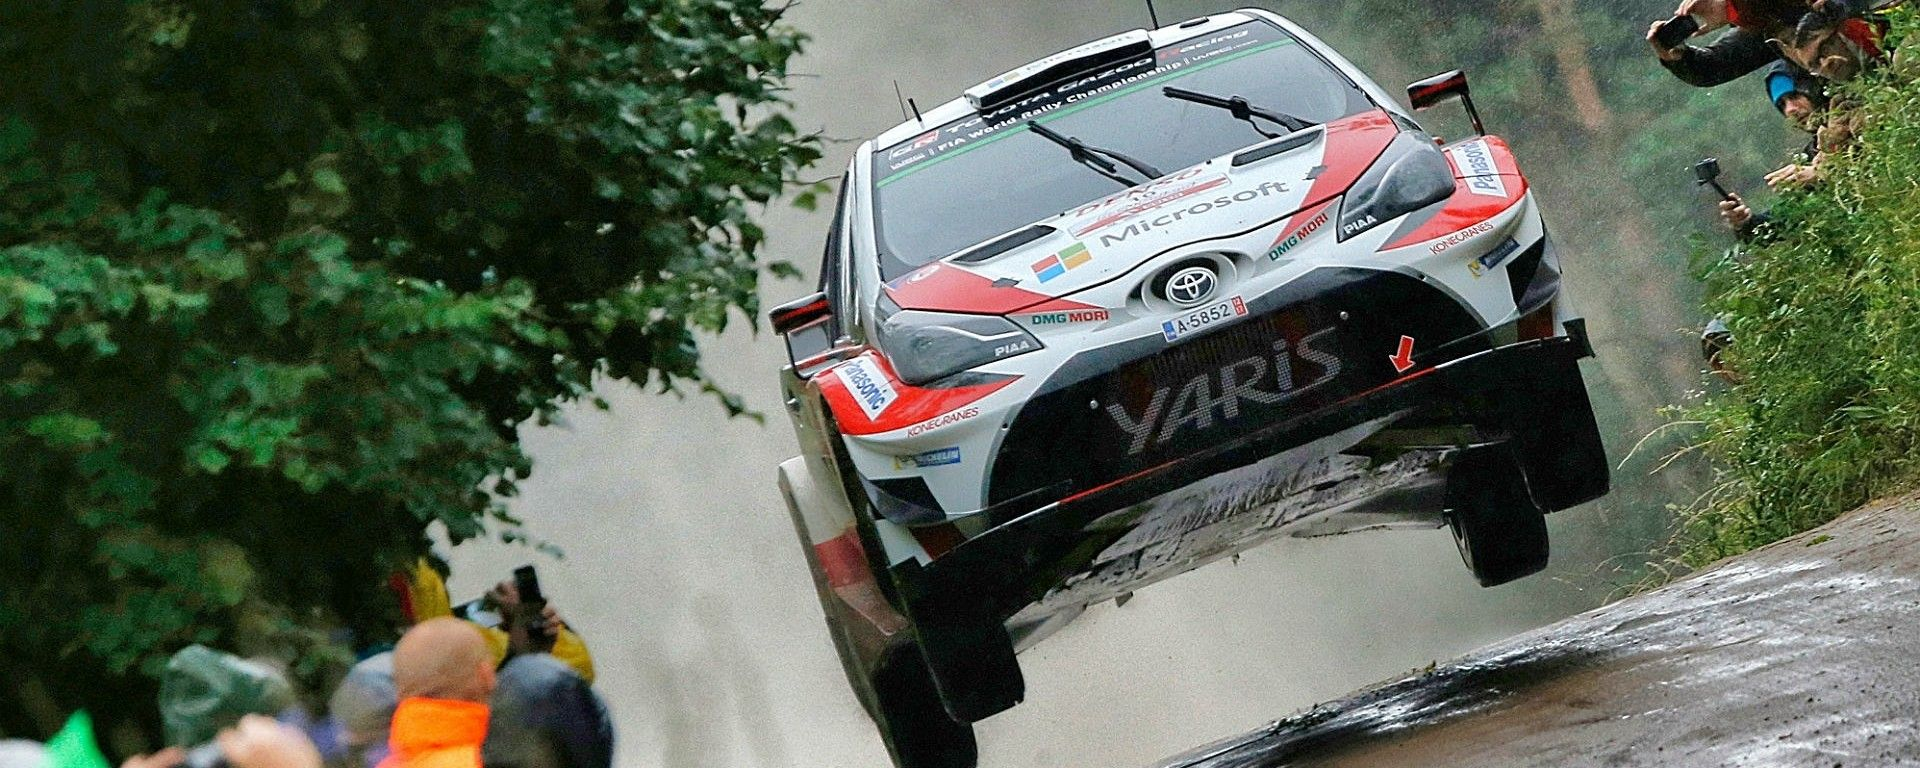 Jari Matti Latvala - Toyota Yaris